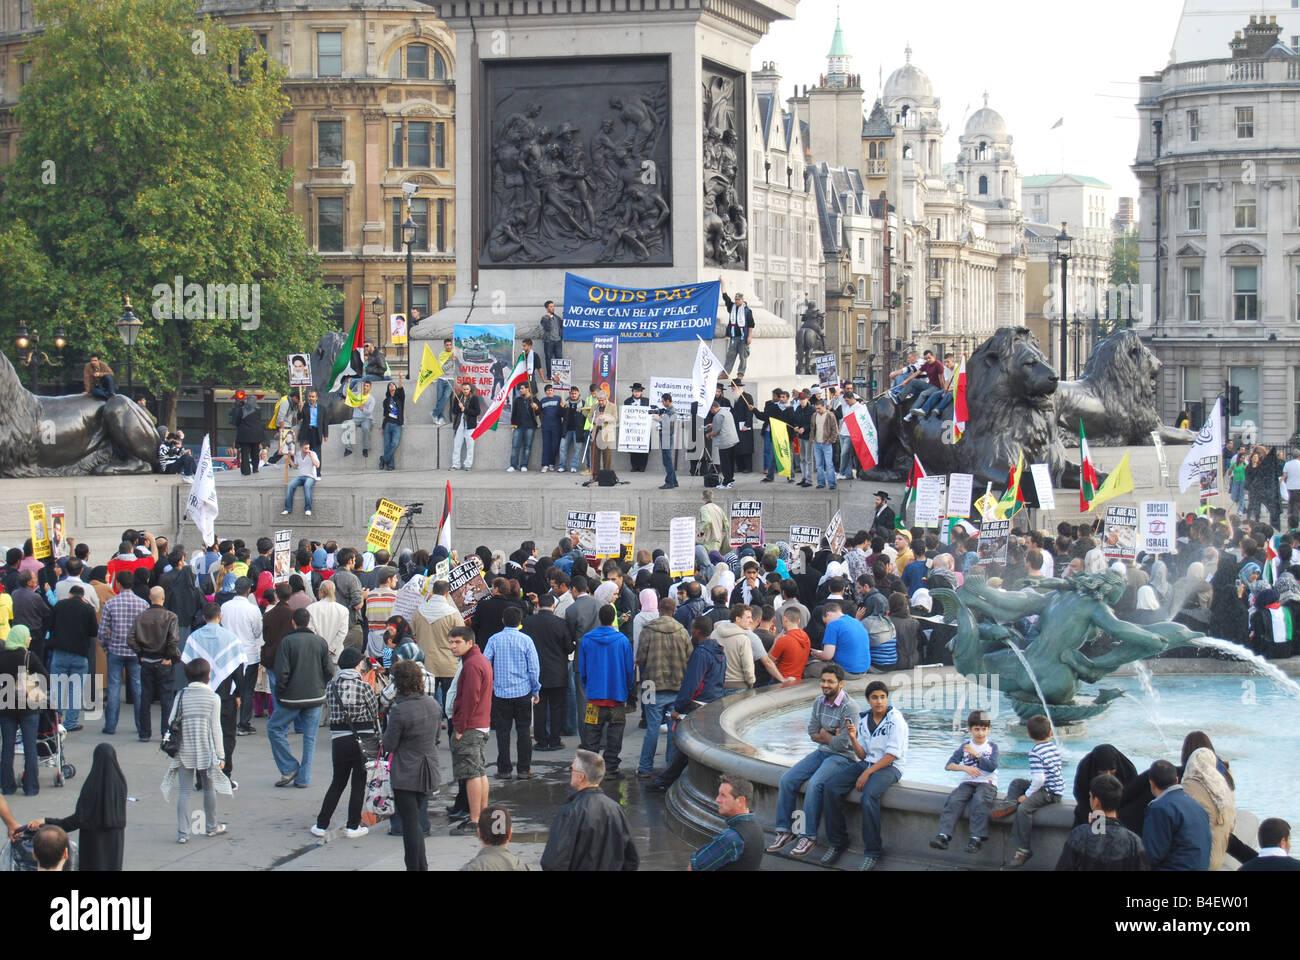 International Al Quds Day Trafalgar Square - Stock Image